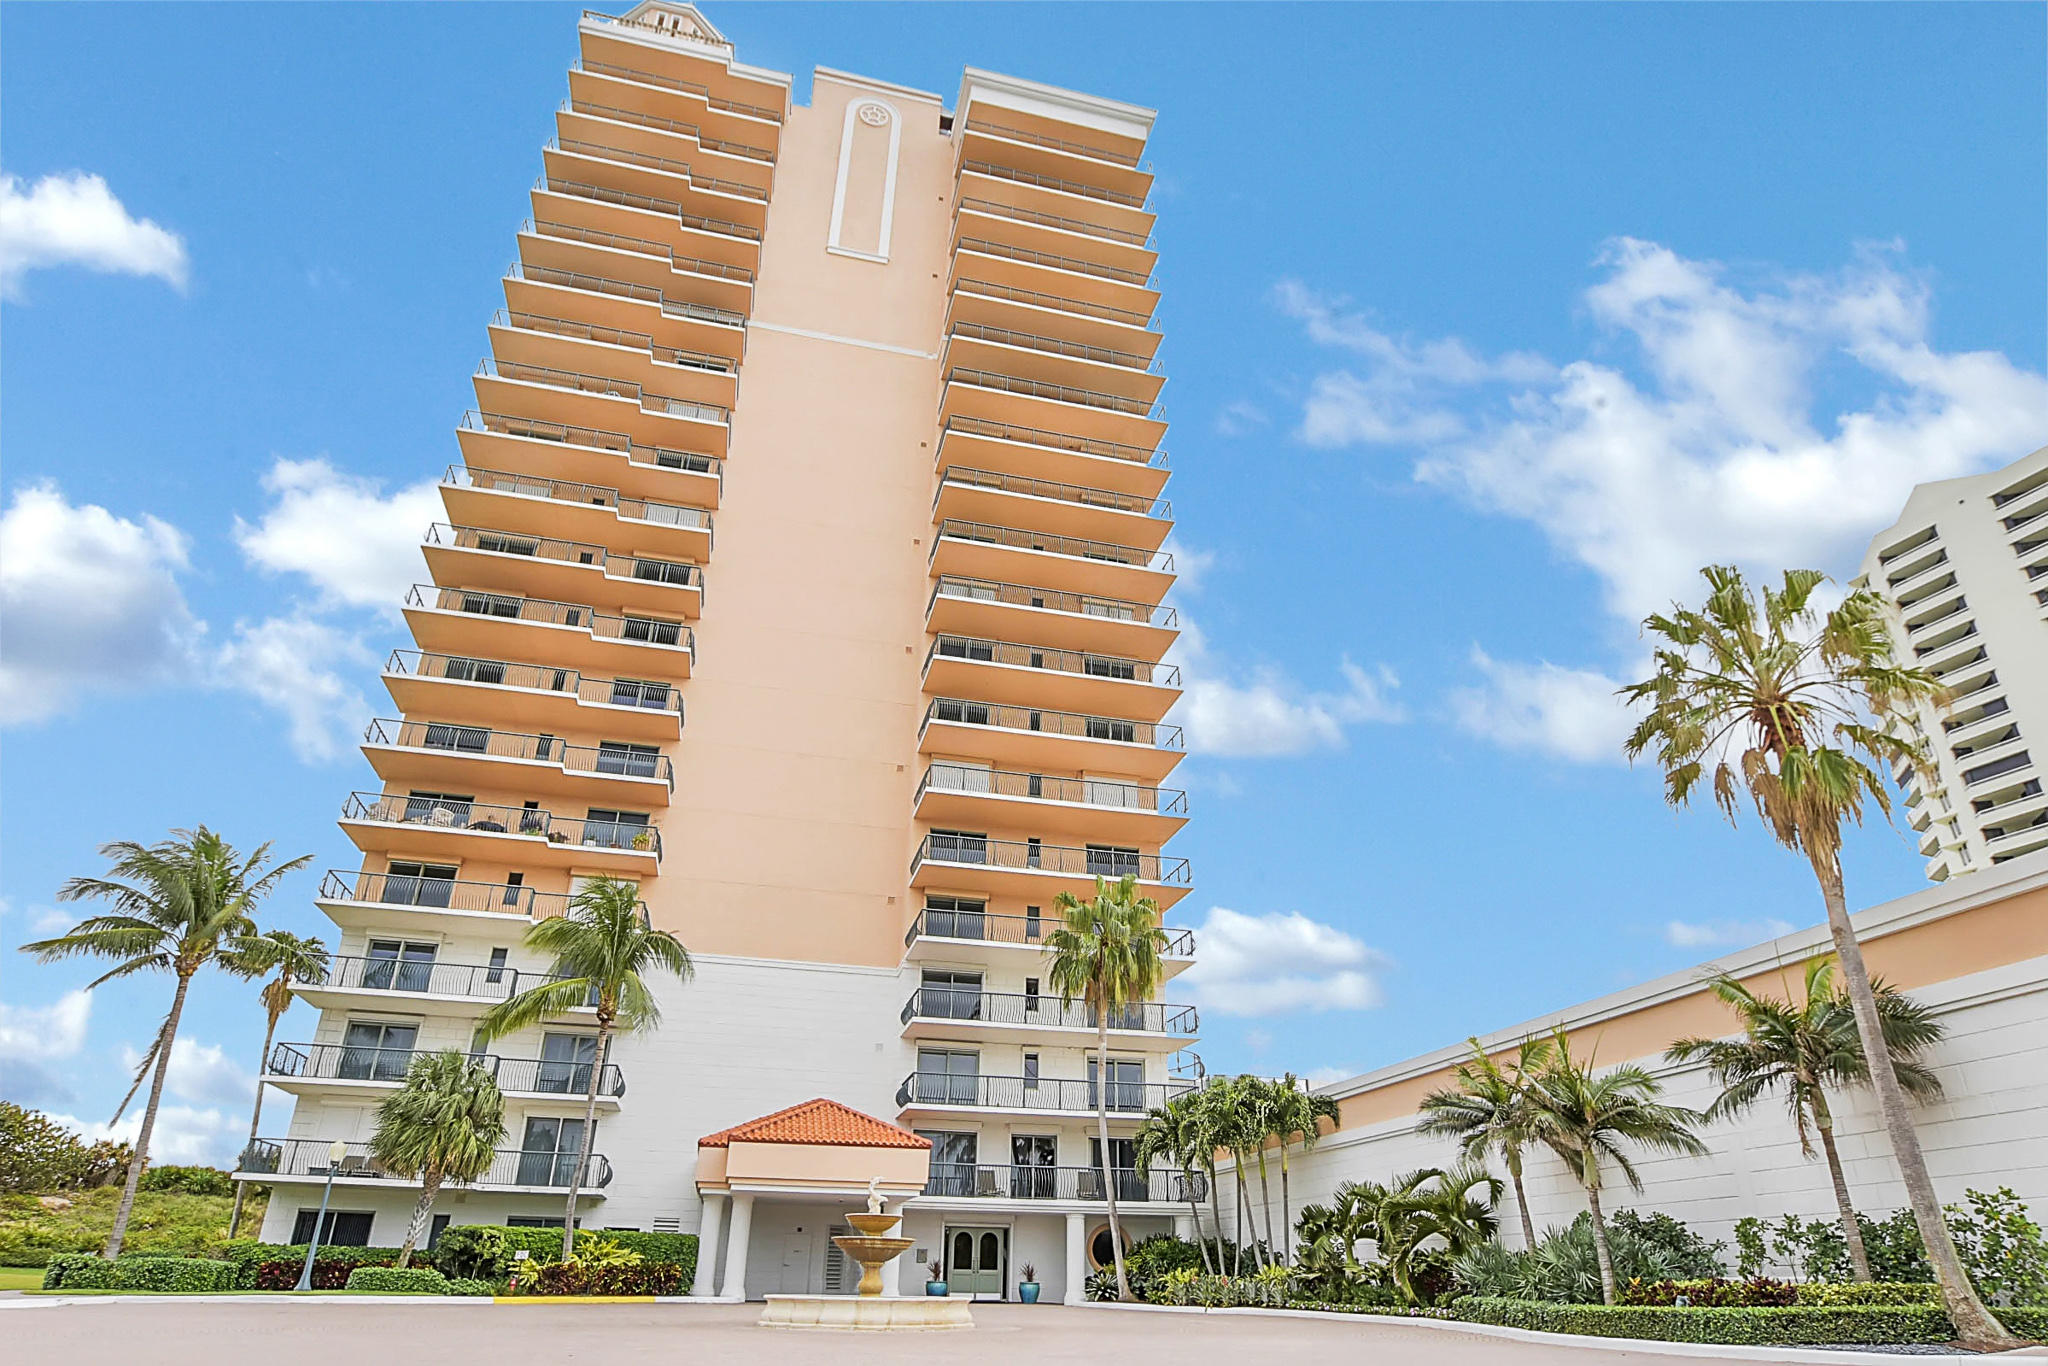 Photo of  Singer Island, FL 33404 MLS RX-10594609